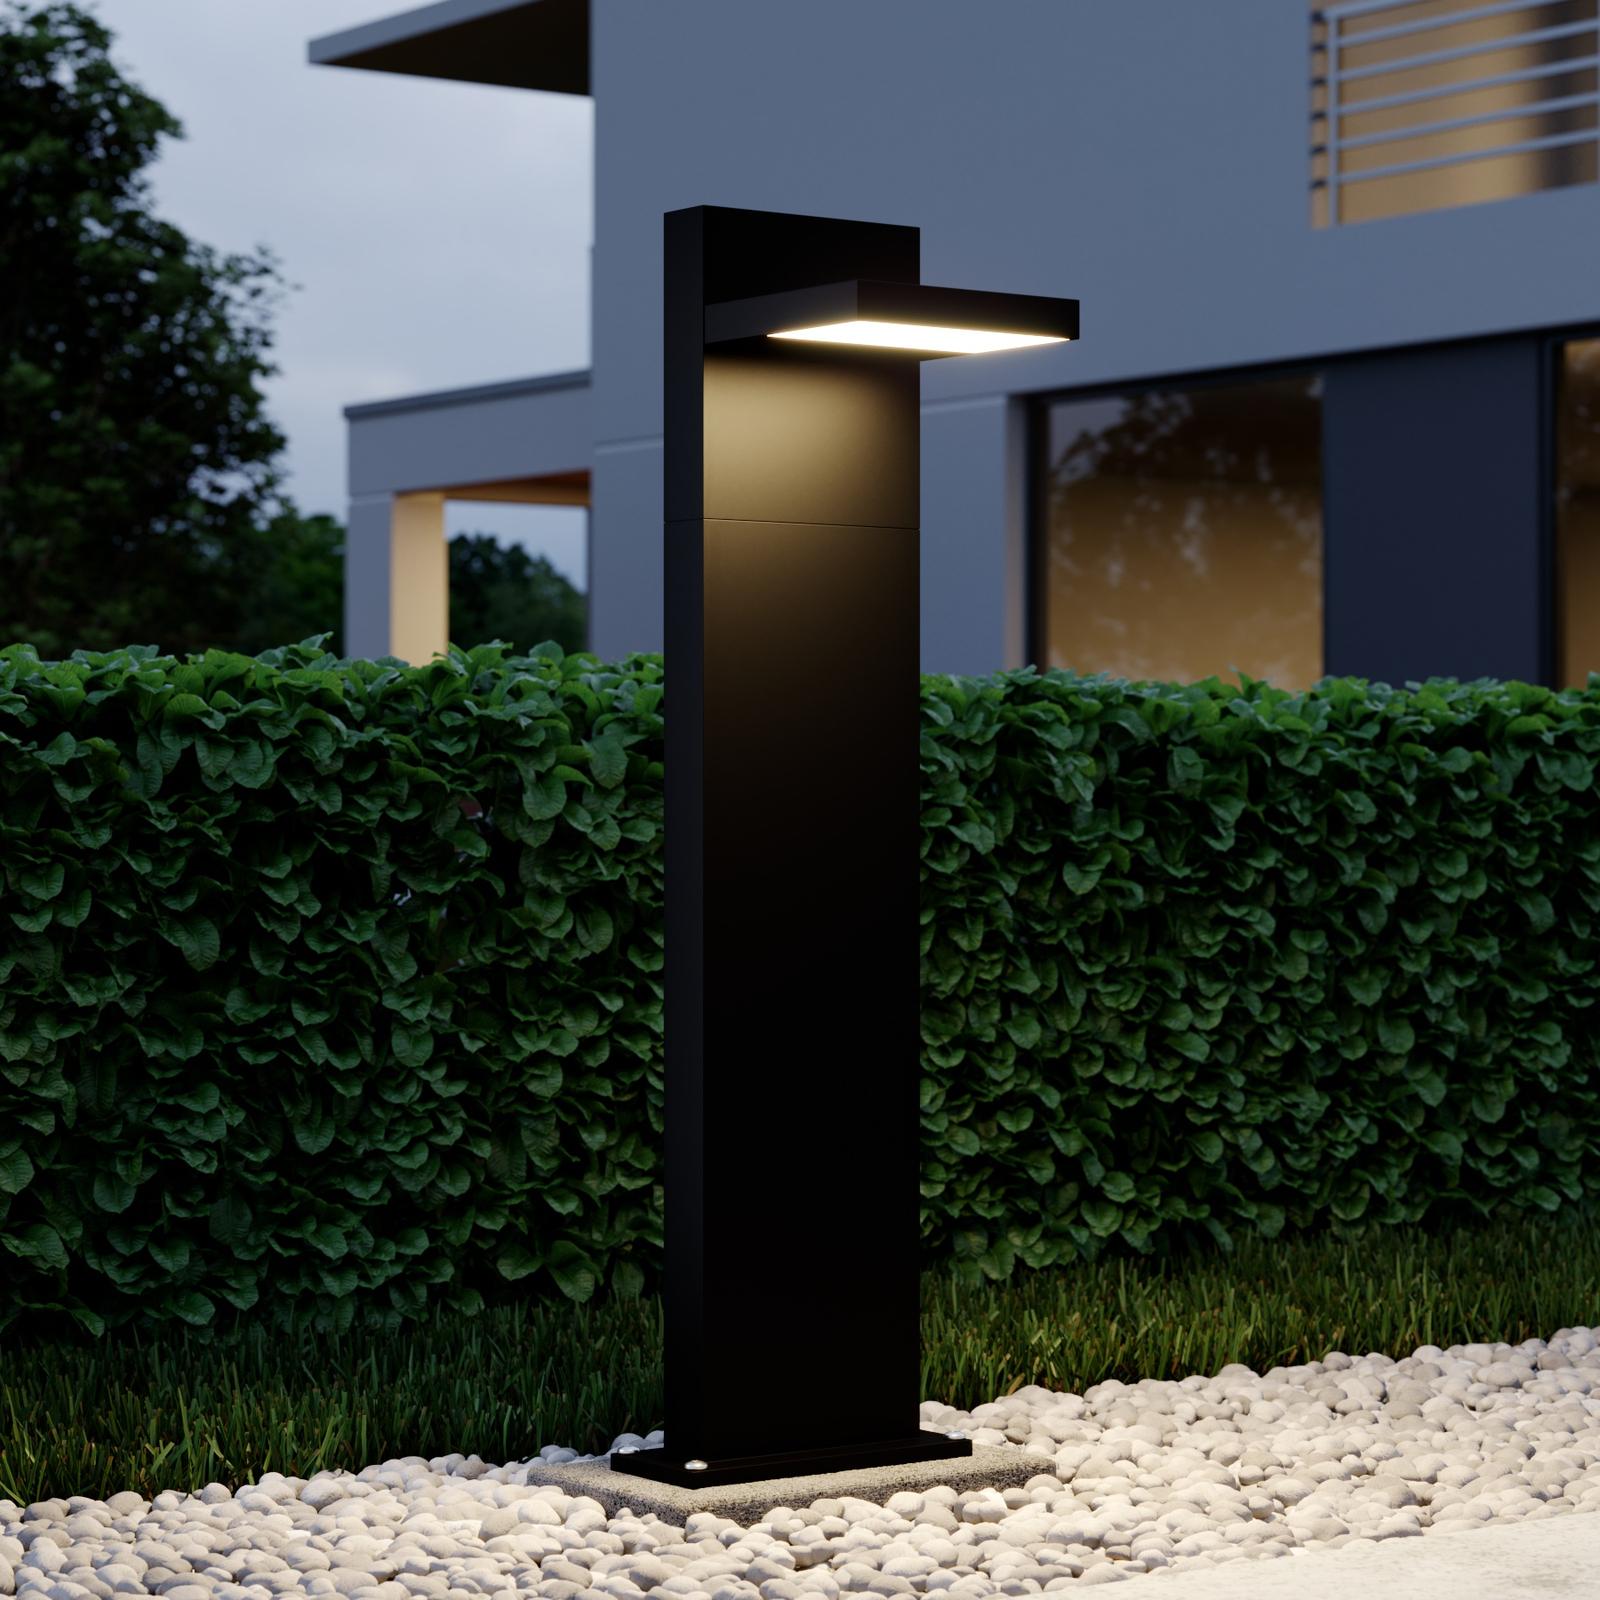 Słupek oświetleniowy LED Silvan, 65 cm